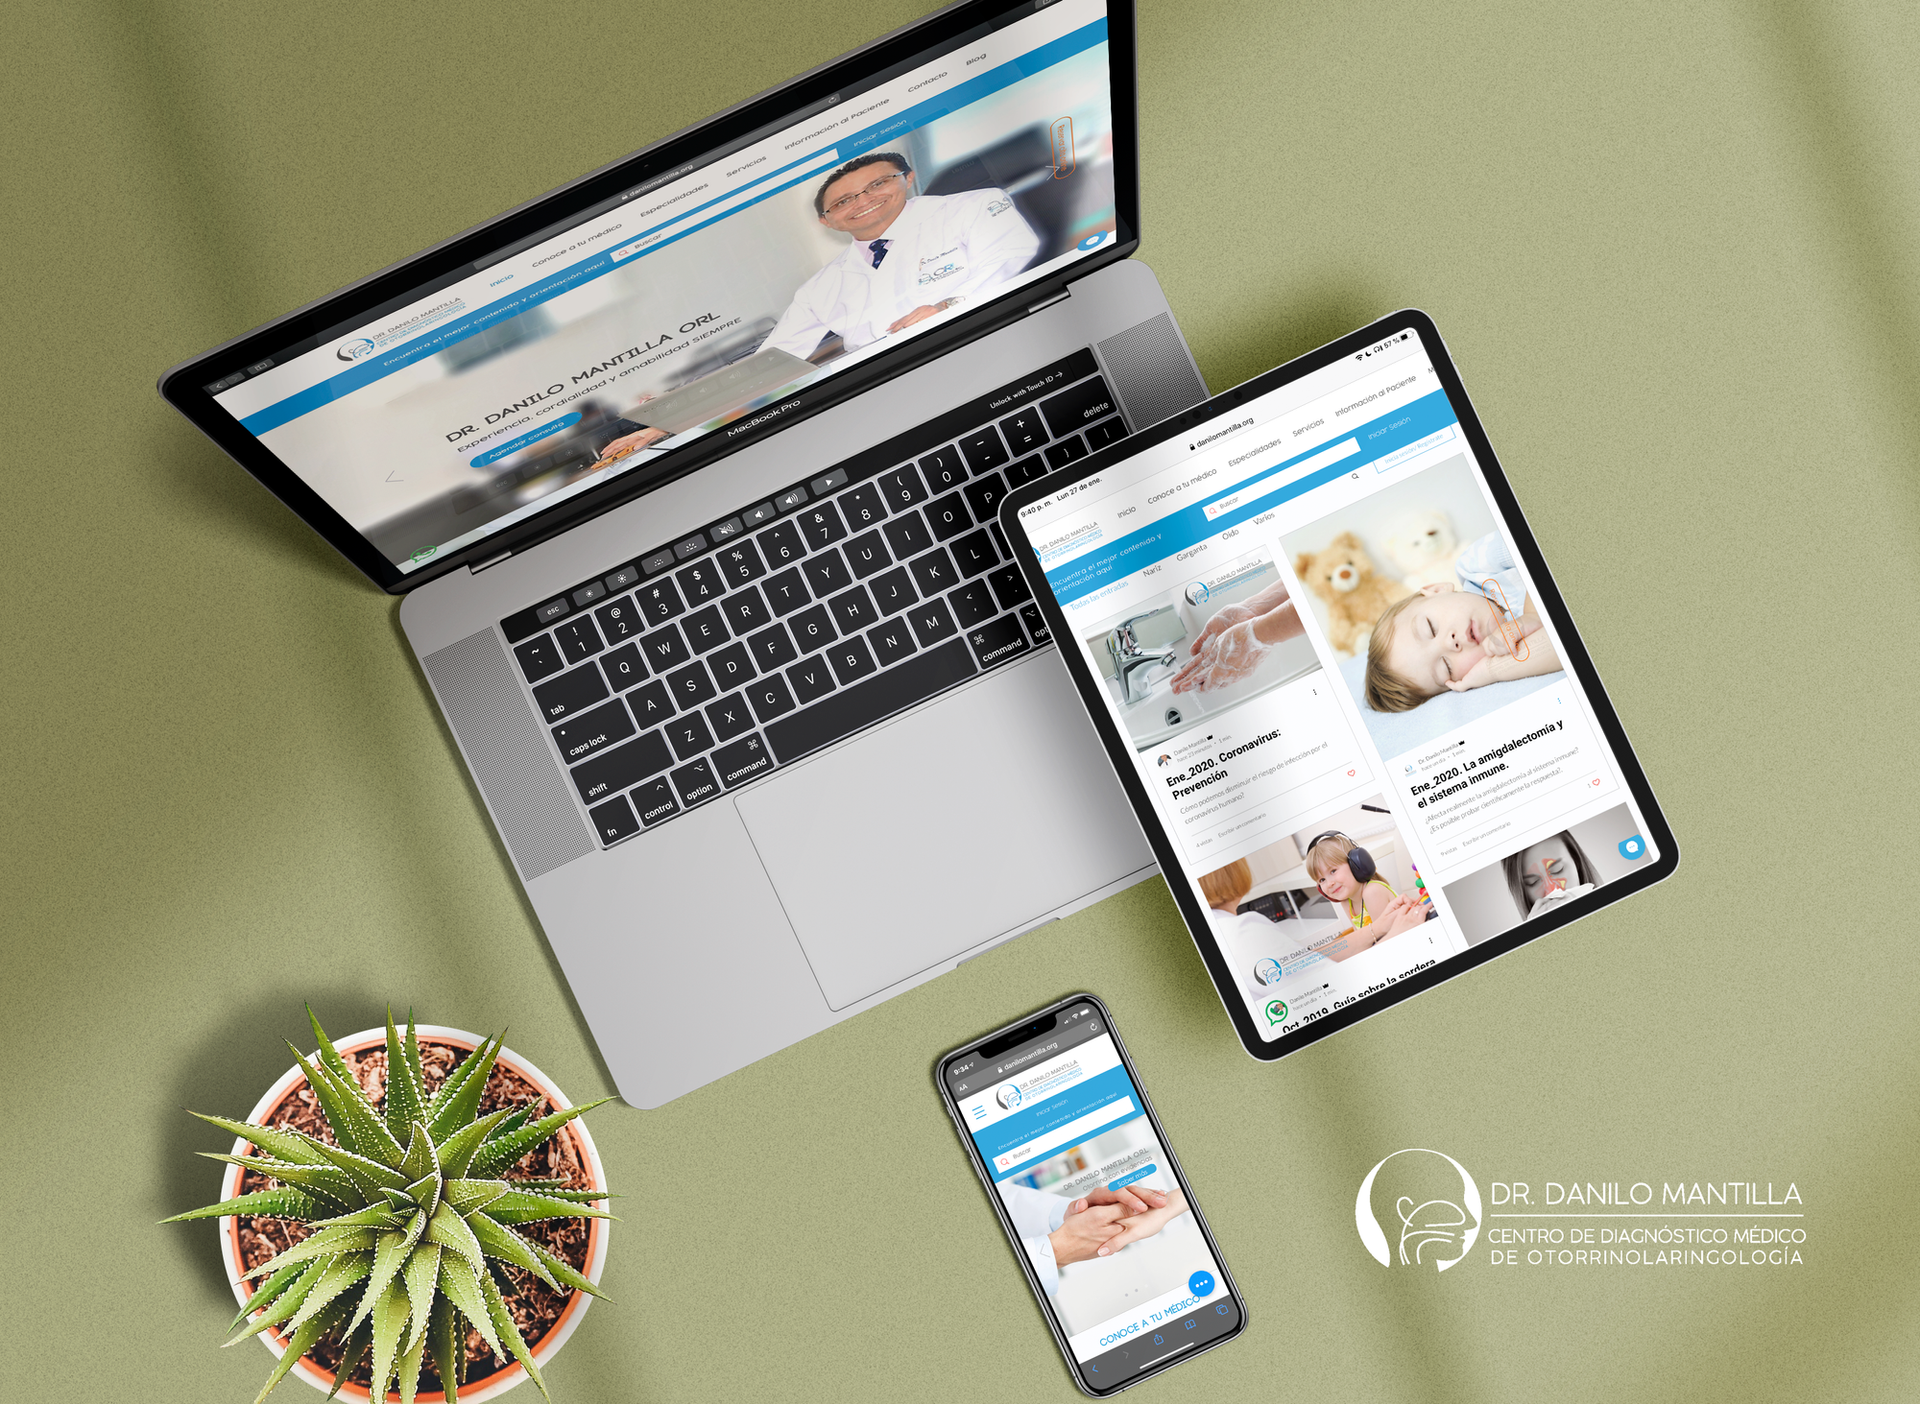 Dr. Danilo Mantilla Blog Site & Brand 🇪🇨